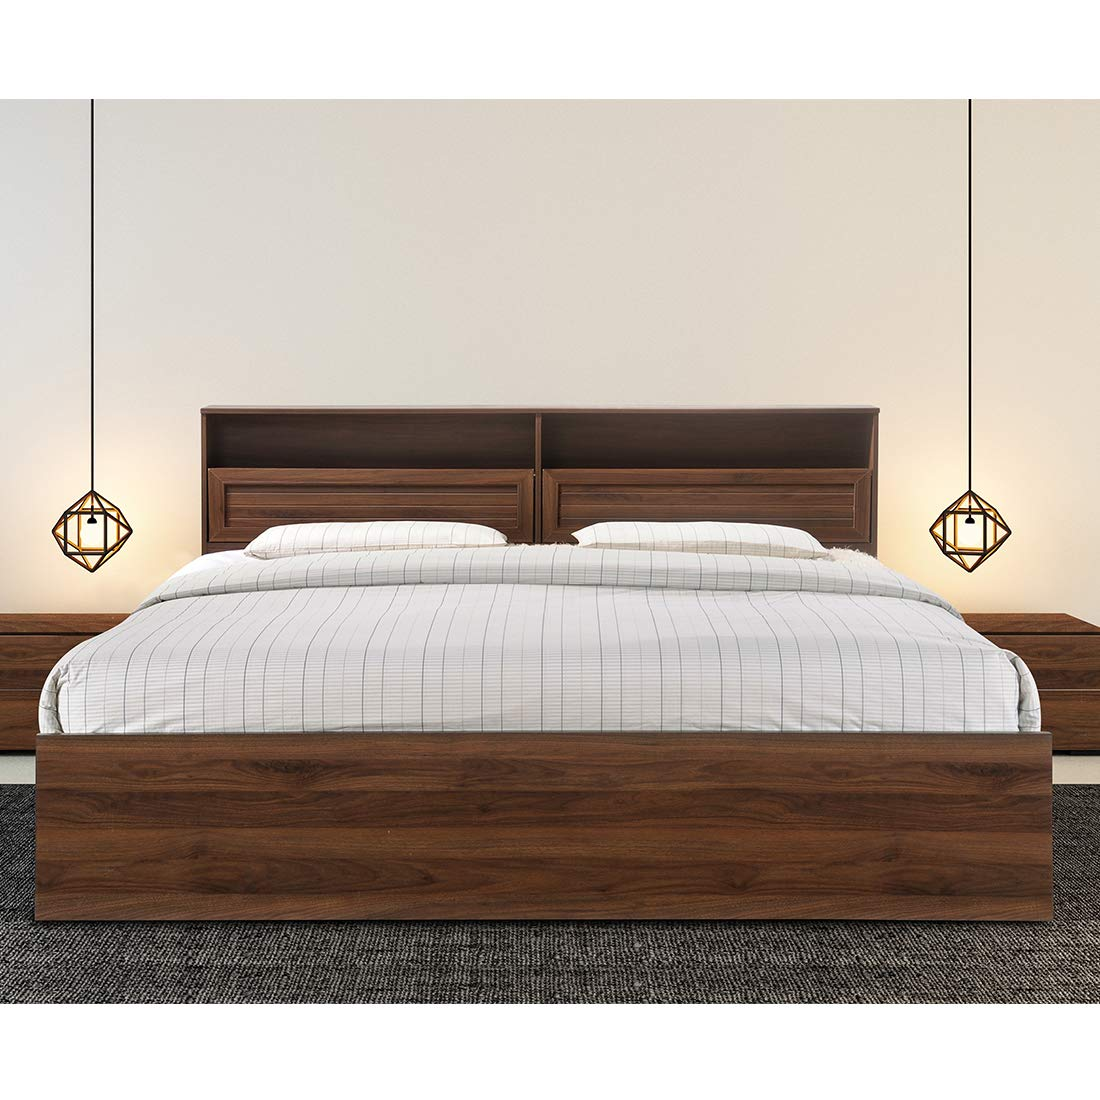 HomeTown Alyssa Engineered Wood Box Storage Queen Size Bed